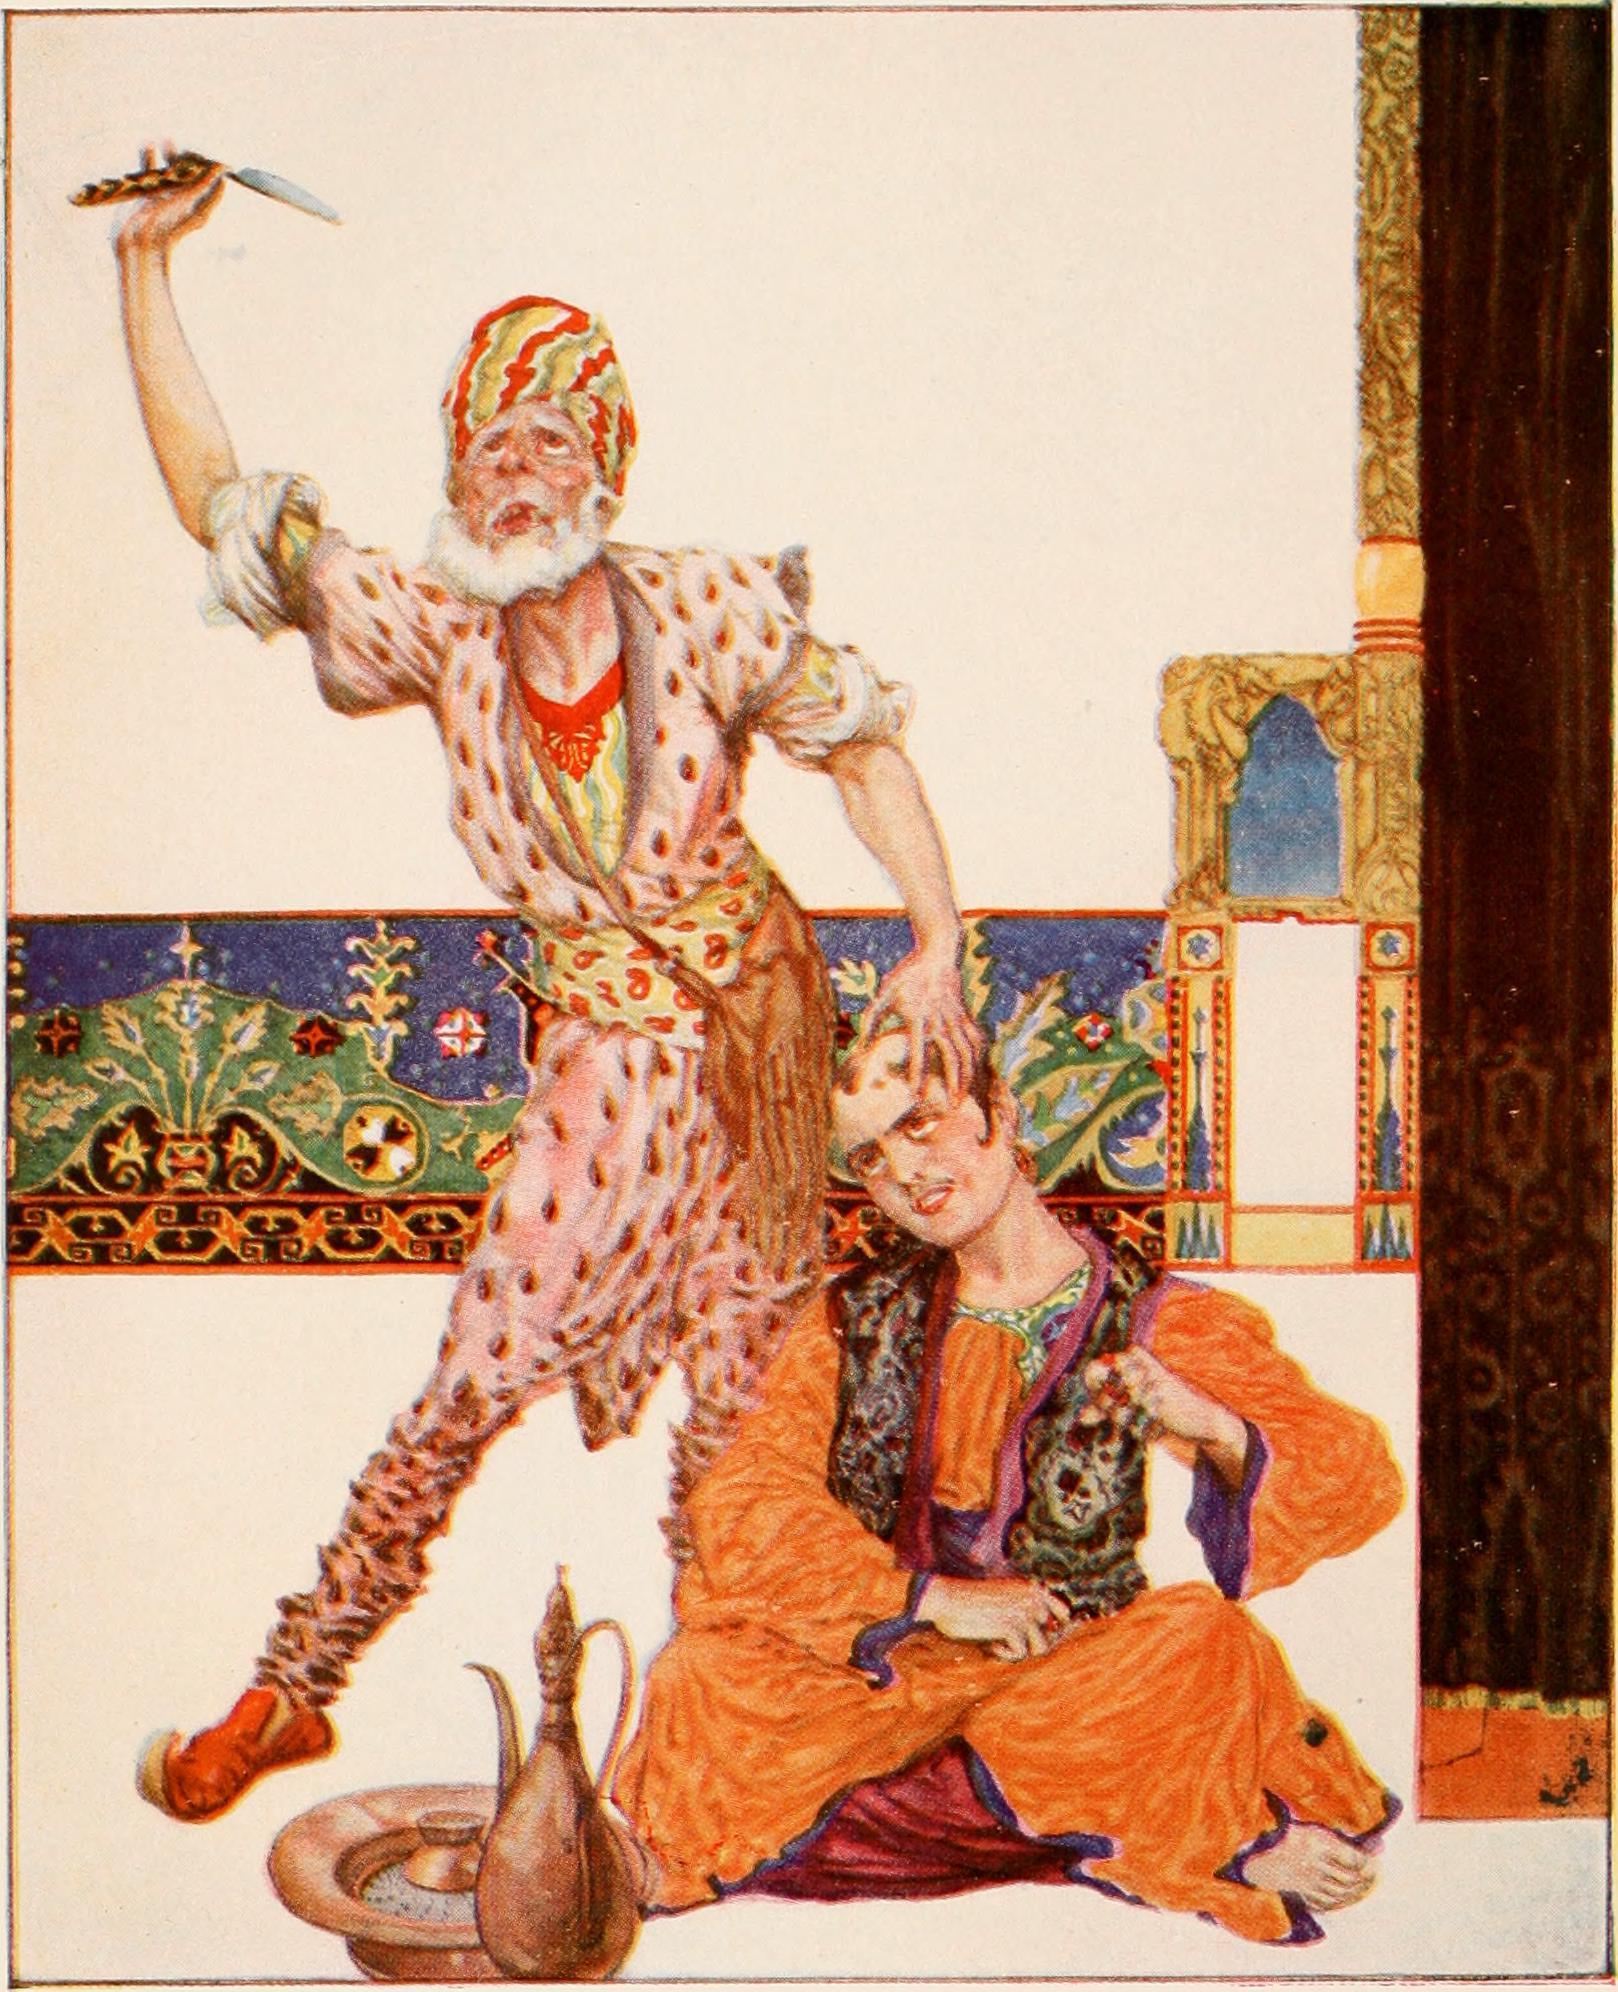 The Story of the Barber, illustration by Frances Jenkins Olcott (1801-1876)